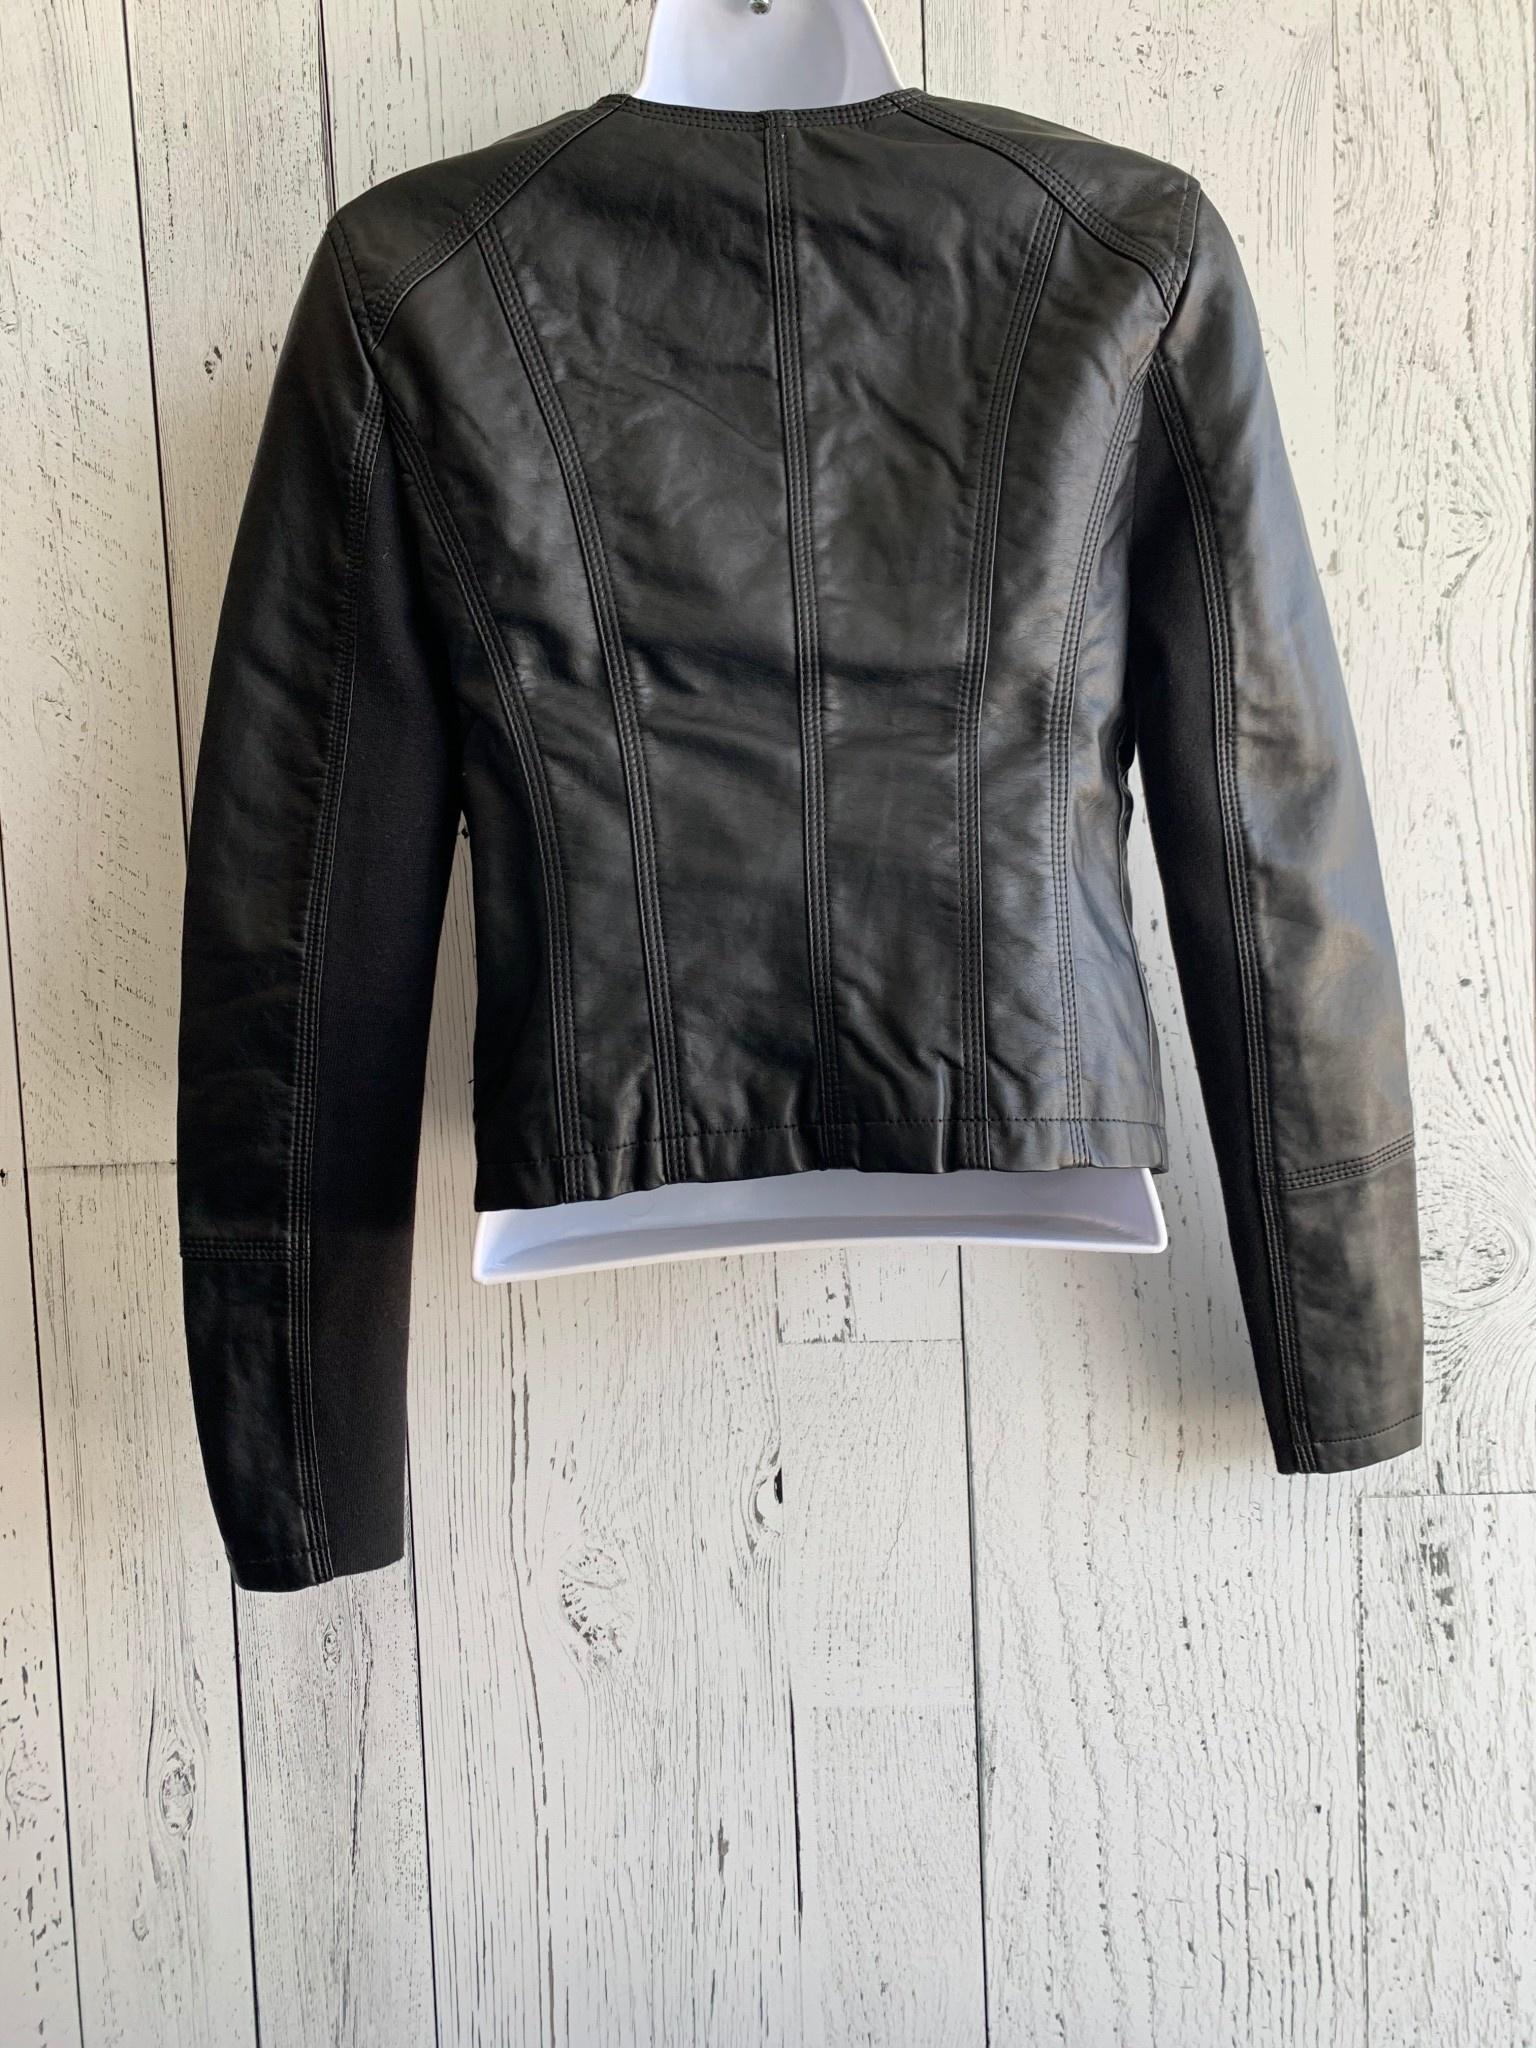 vero moda - short faux leather jacket